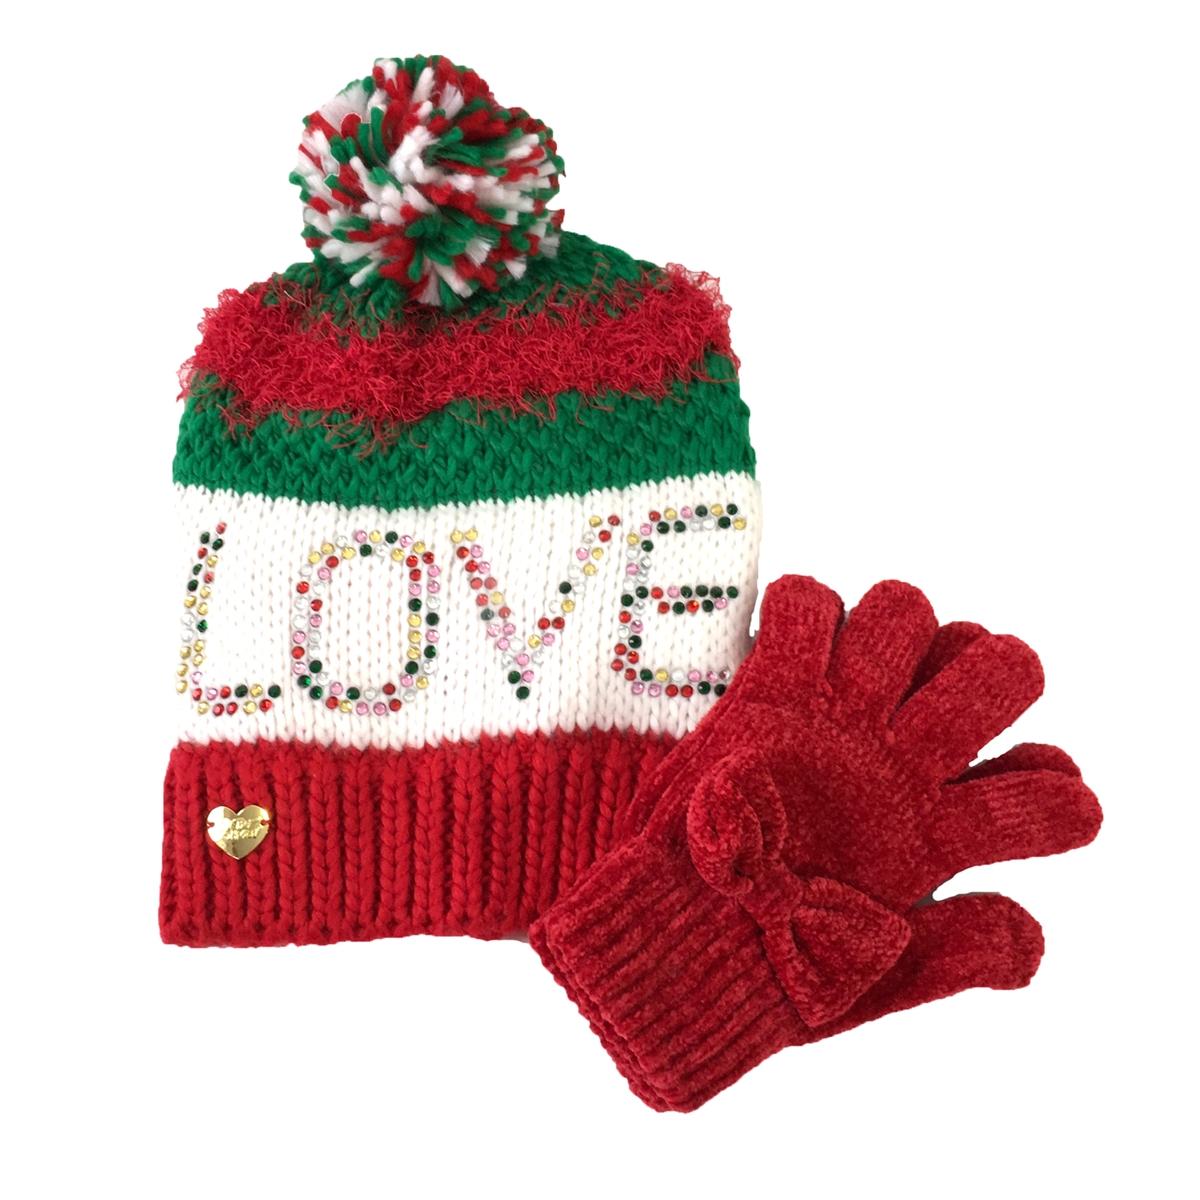 d3409bac9c5 Betsey Johnson Love Beanie Hat   Chenille Bow Glove Set